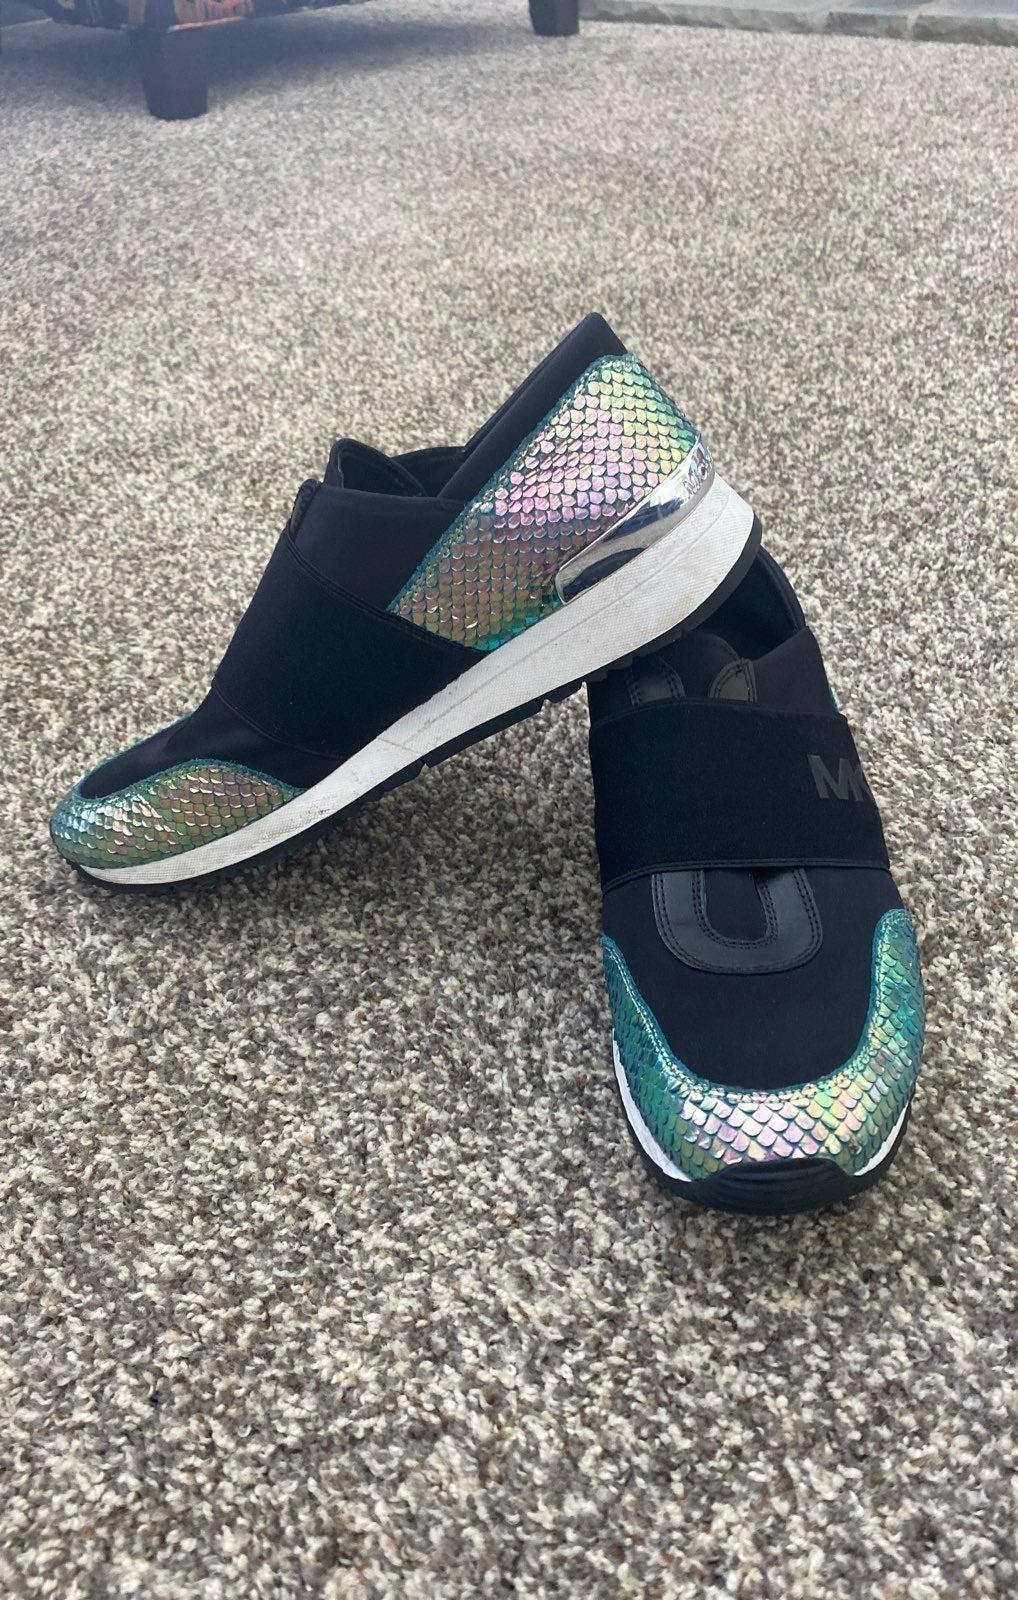 Michael Kors Holgram/Iridescent Sneaker